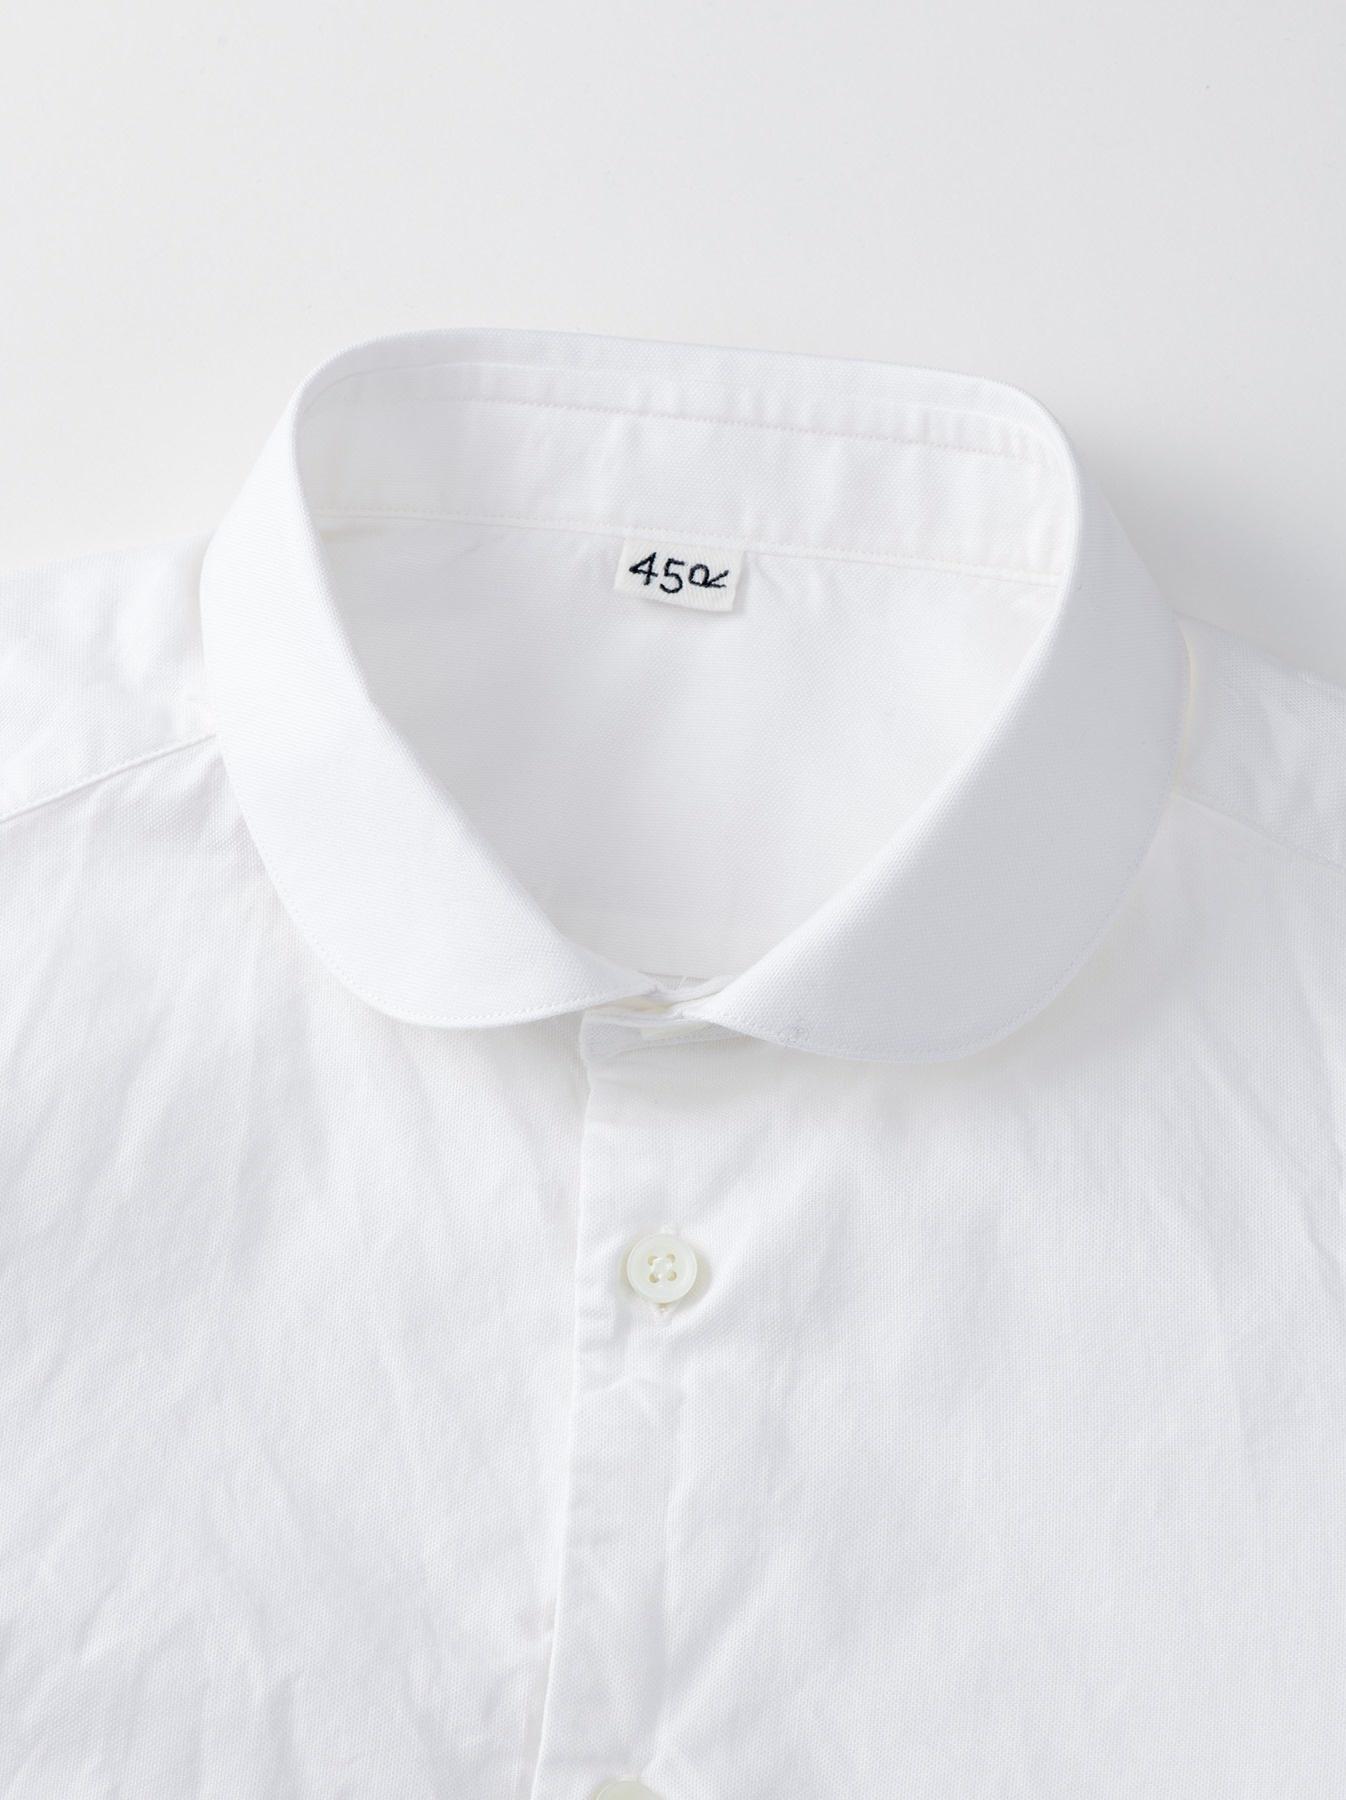 WH Oxford 908 Round Collar Shirt-6